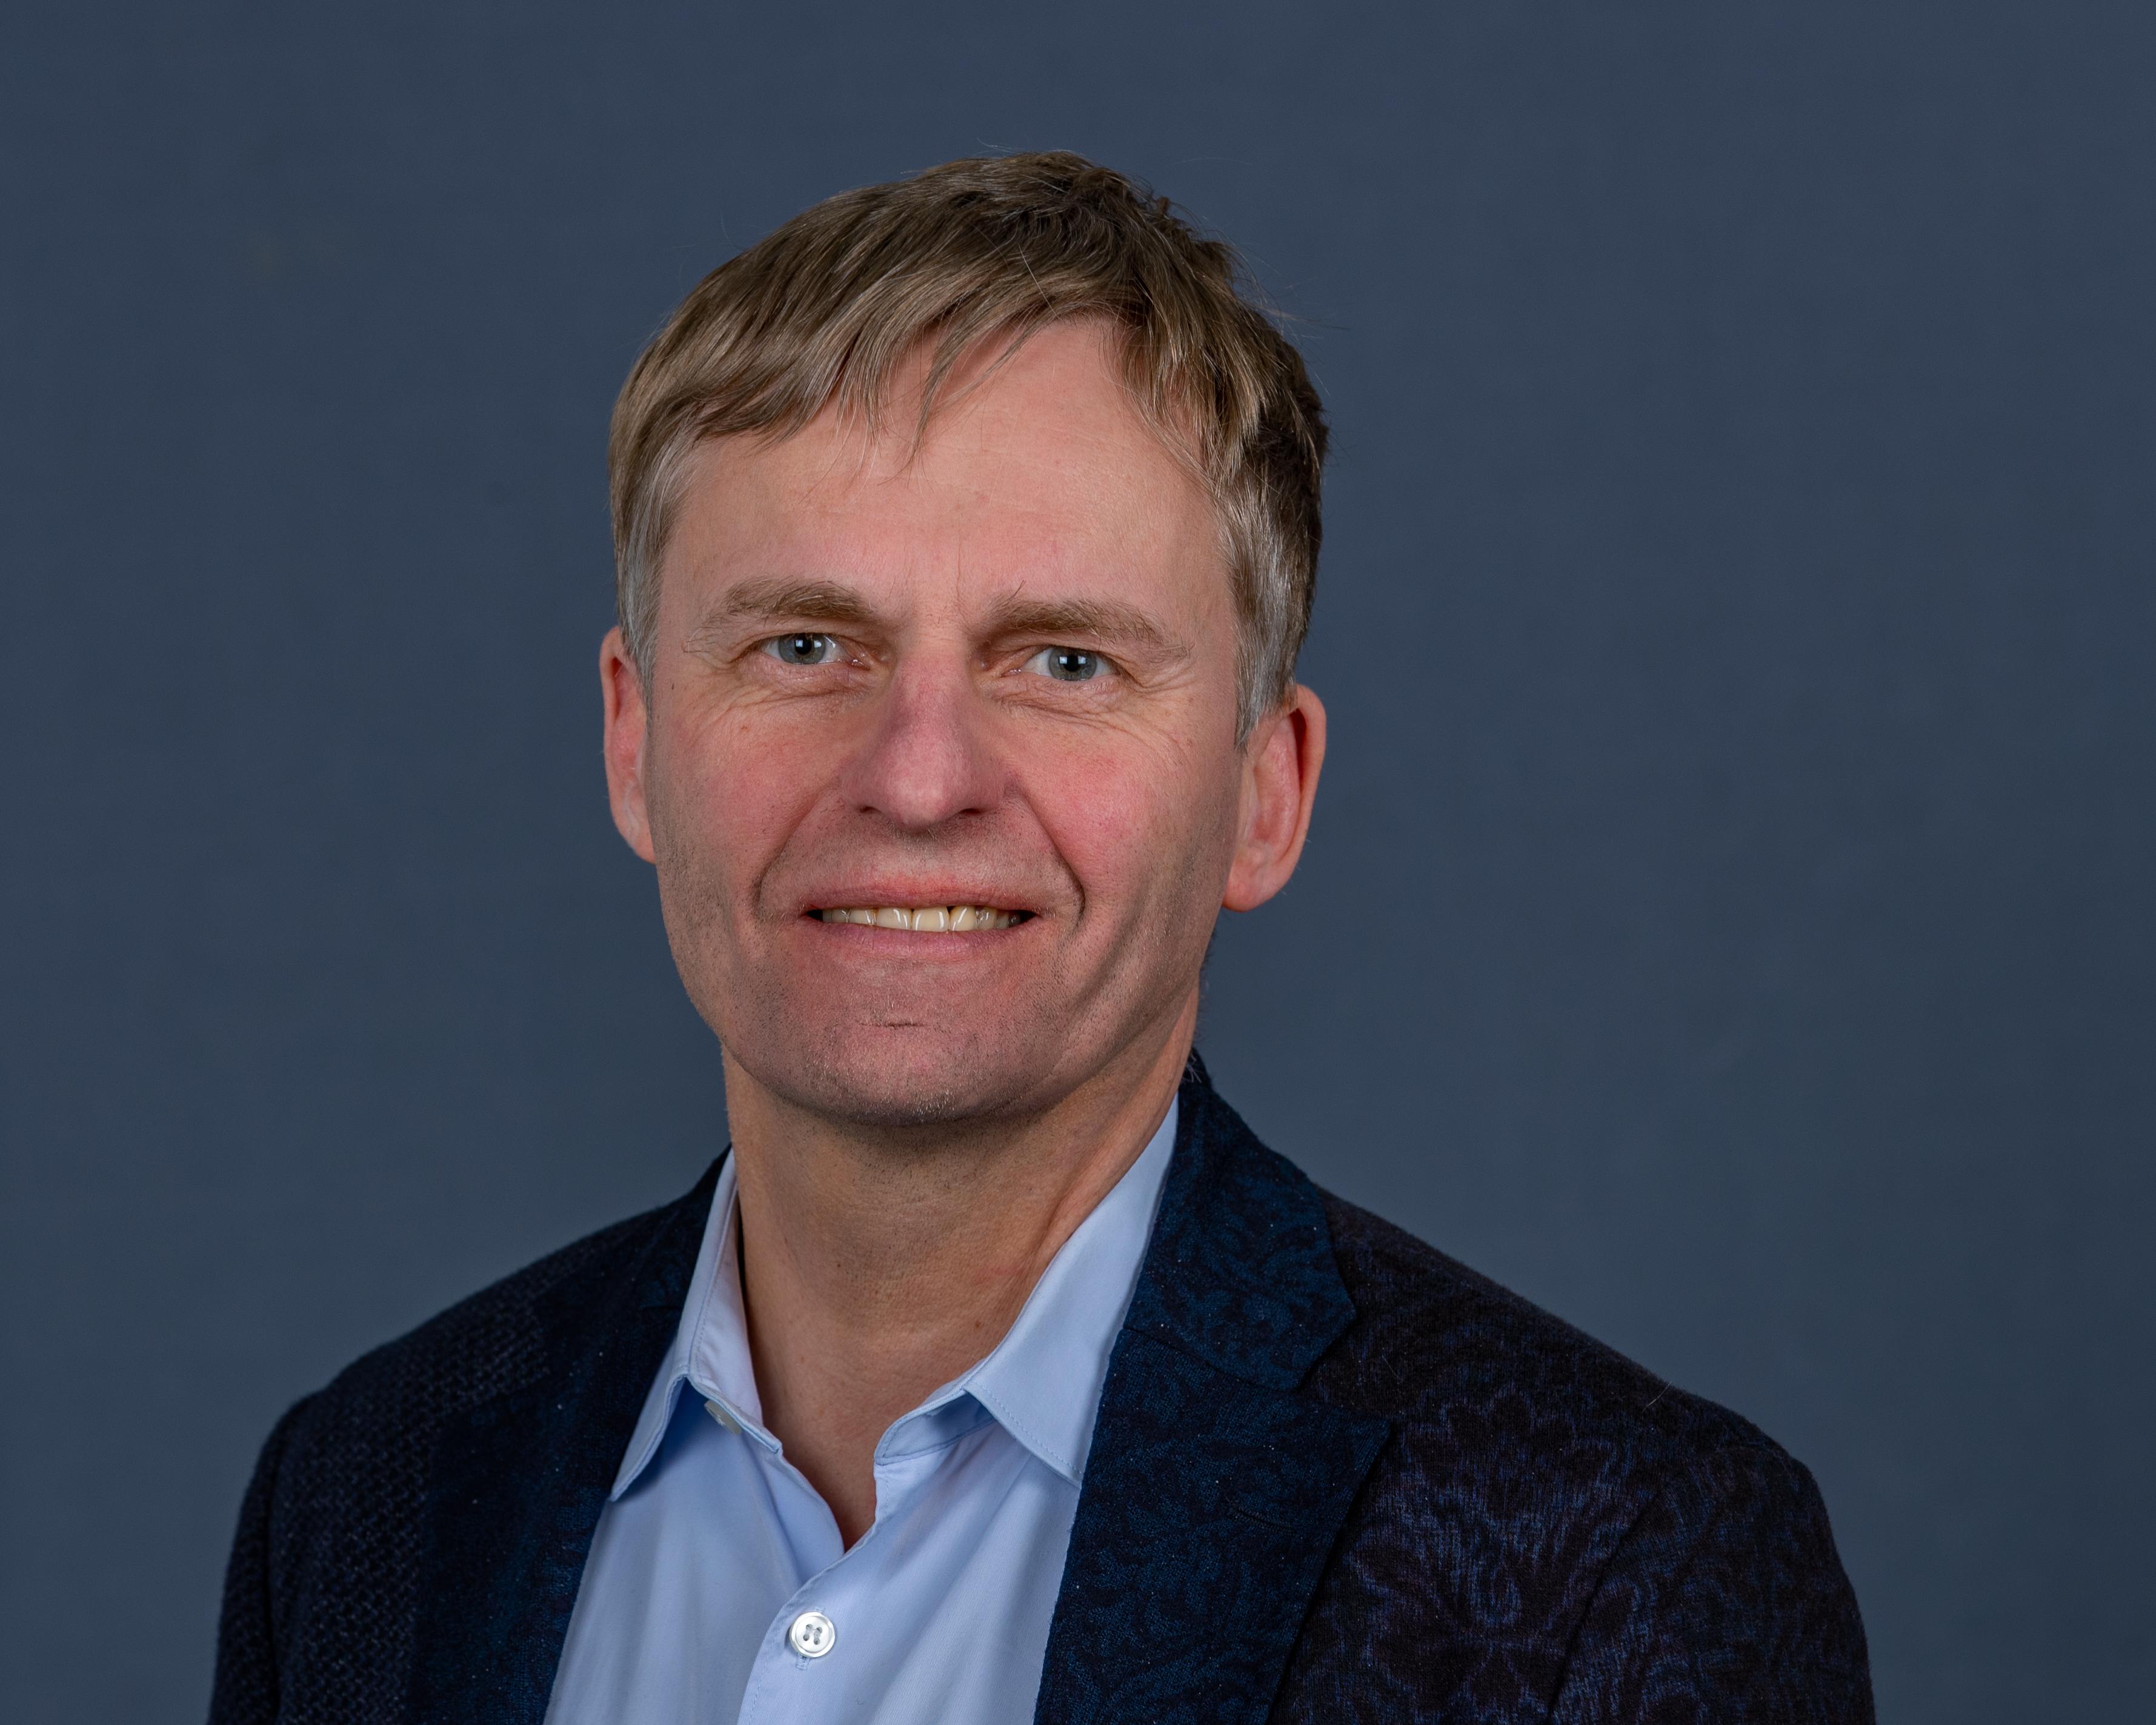 Rudiger Kruse Wikipedia